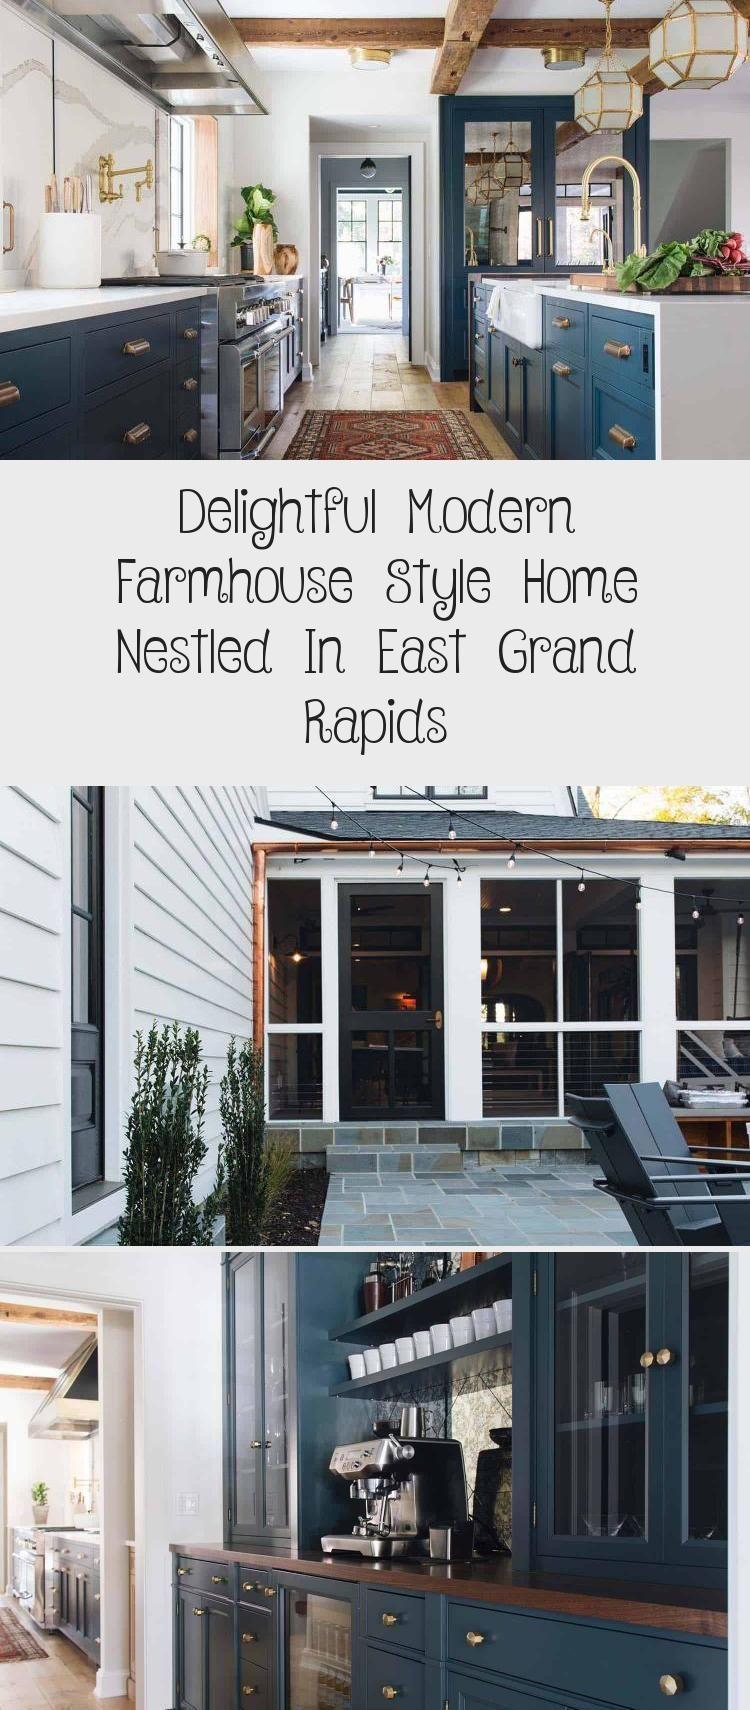 Delightful Modern Farmhouse Style Home Nestled In East Grand Rapids Erin S Blog In 2020 Modern Farmhouse Style Farmhouse Style House Modern Farmhouse